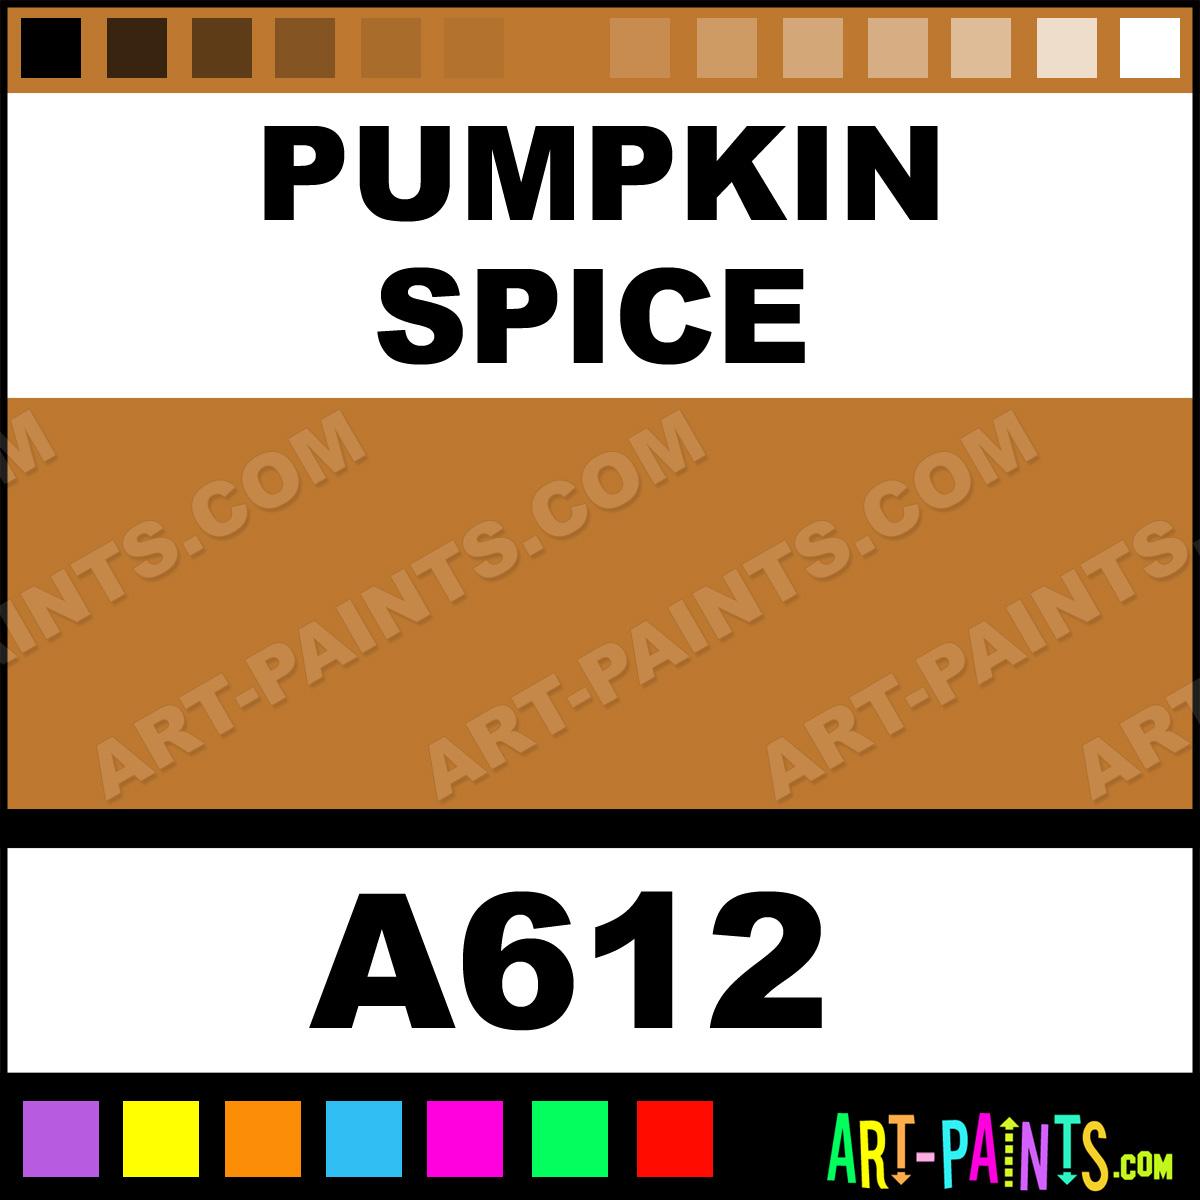 pumpkin spice ultra ceramic ceramic porcelain paints - a612